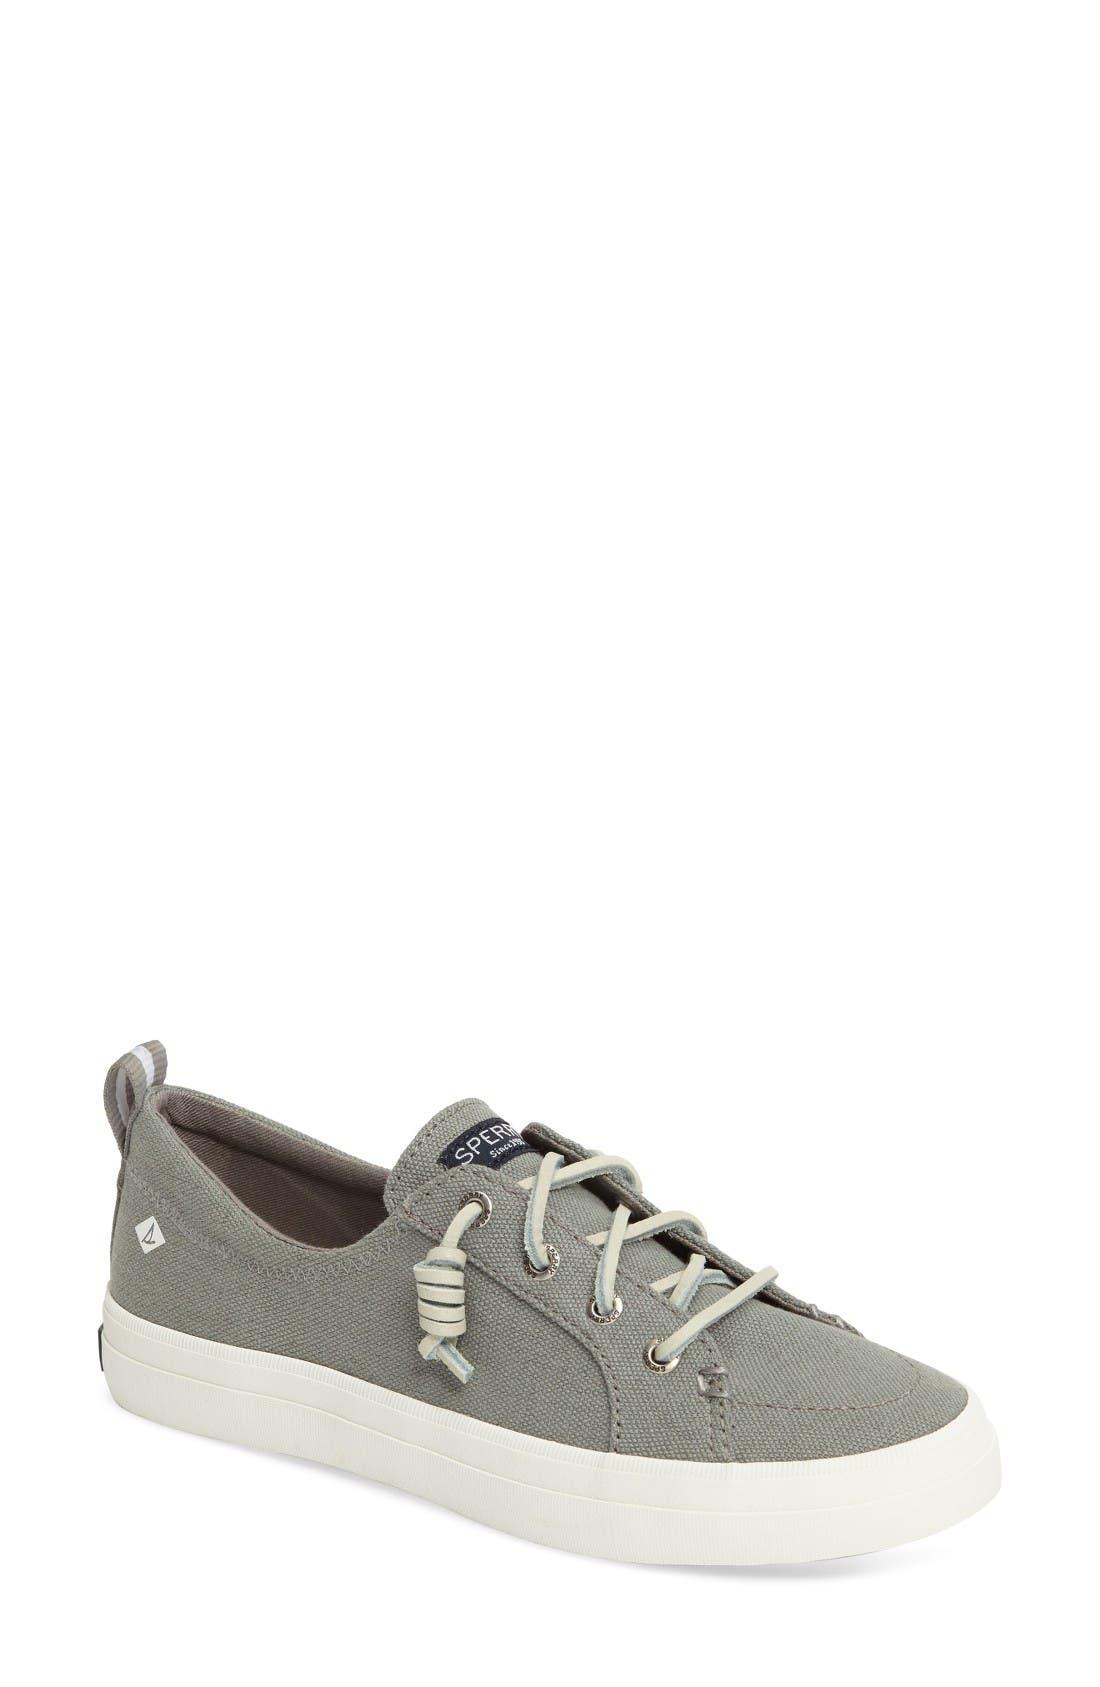 Crest Vibe Sneaker,                             Main thumbnail 1, color,                             Grey Canvas